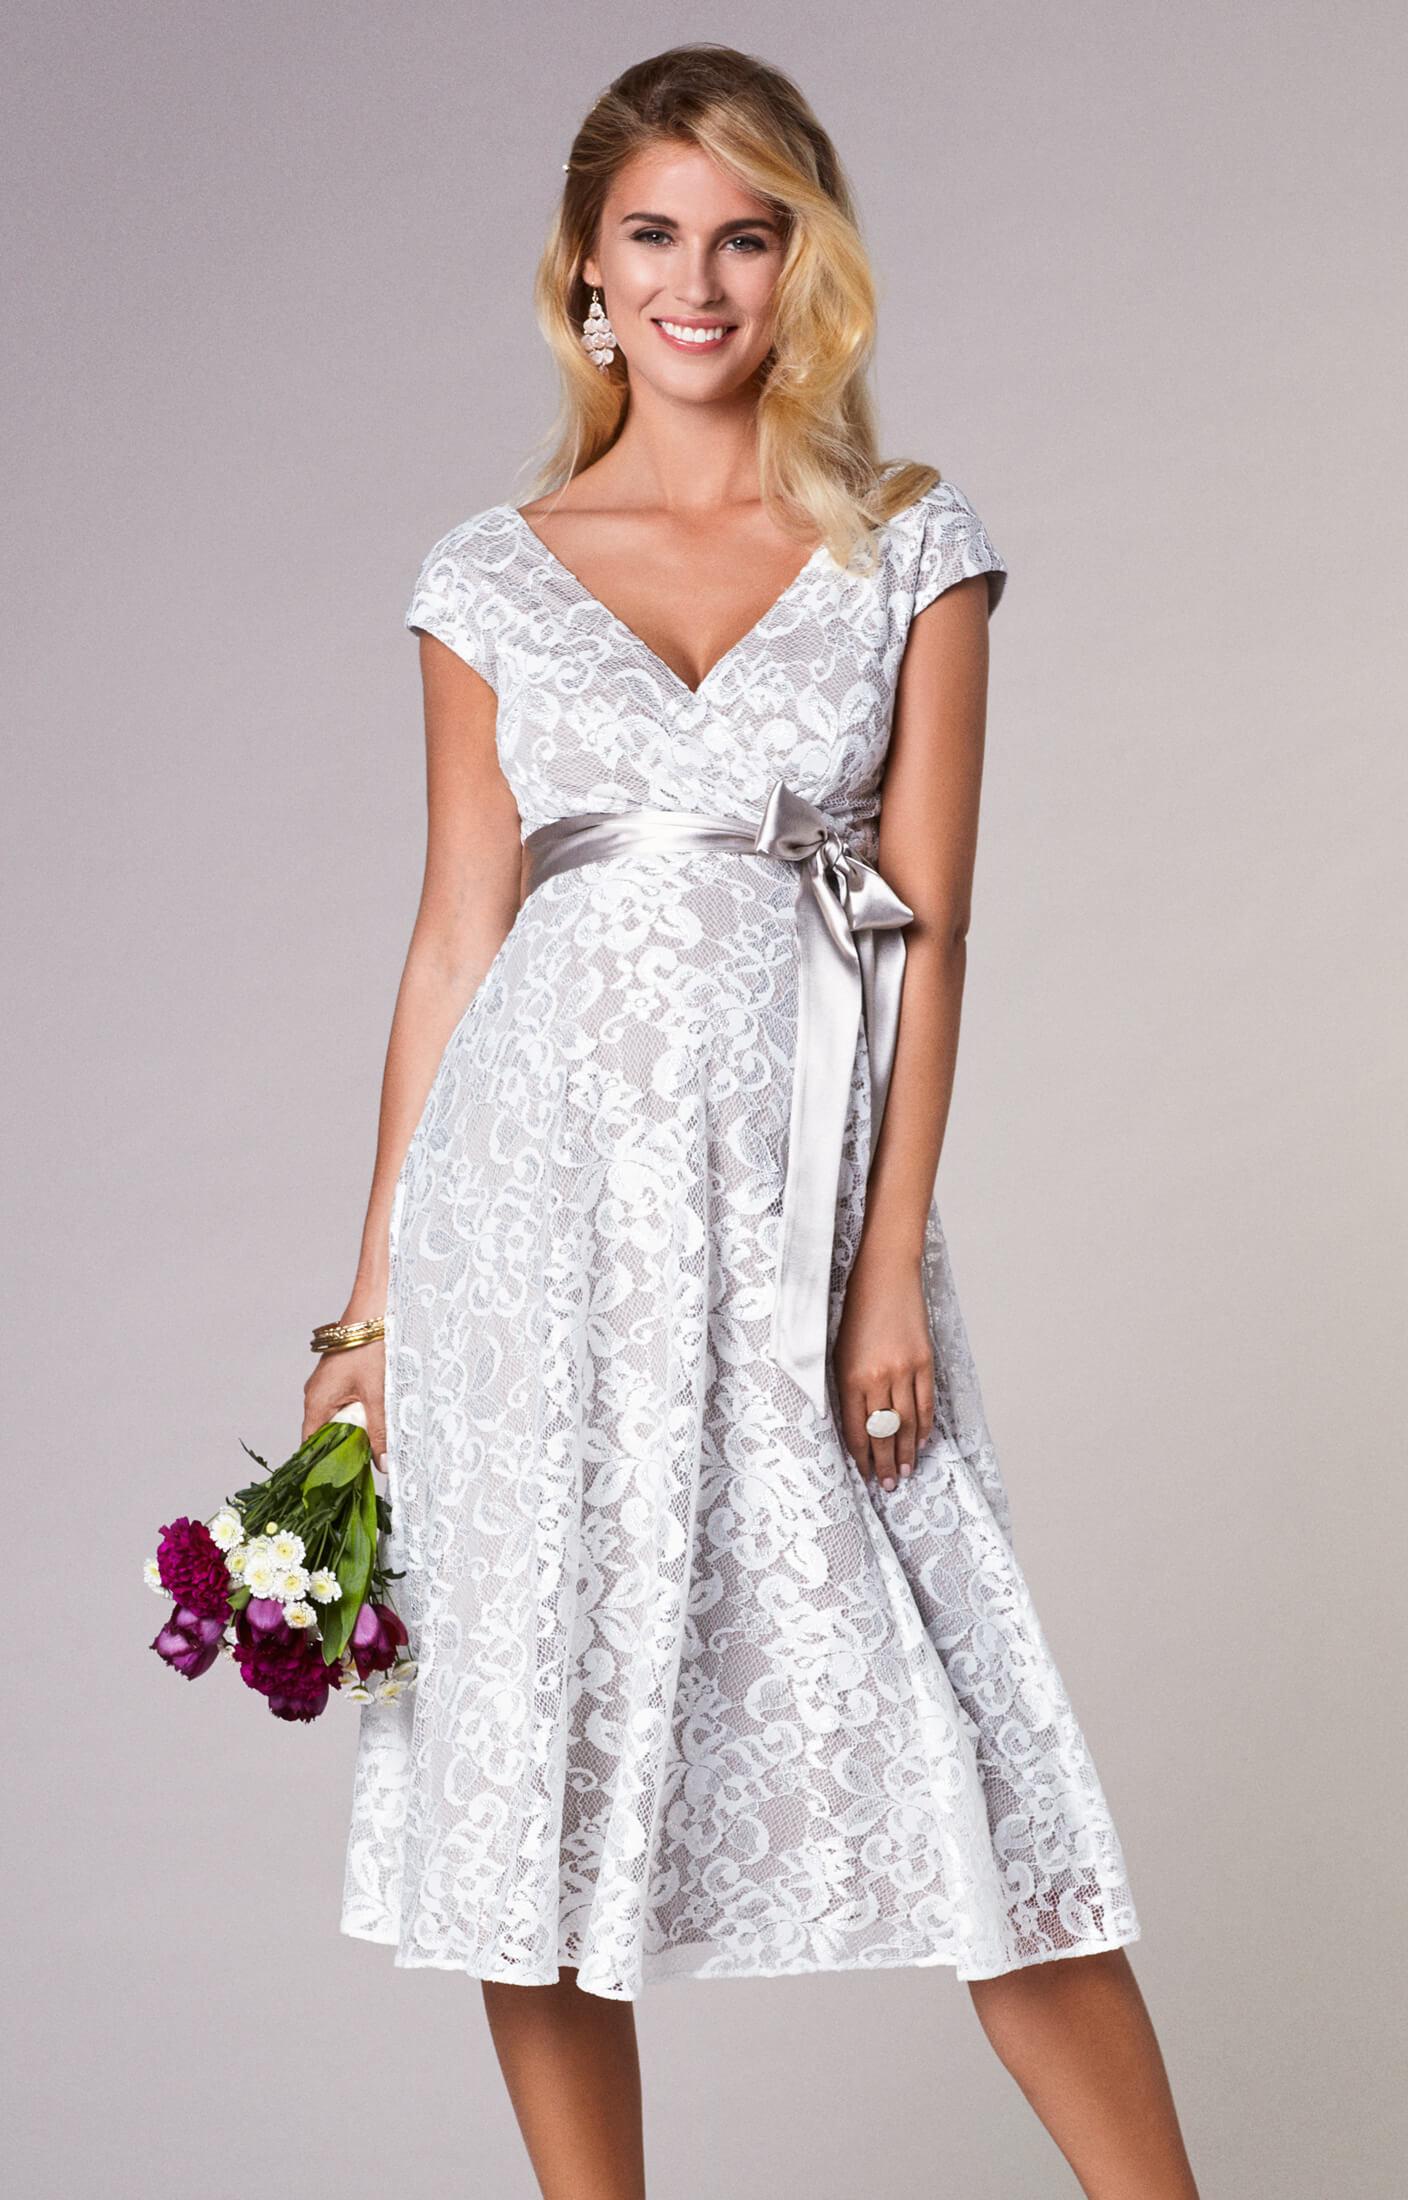 Orla Maternity Wedding Lace Dress Oyster Cream Maternity